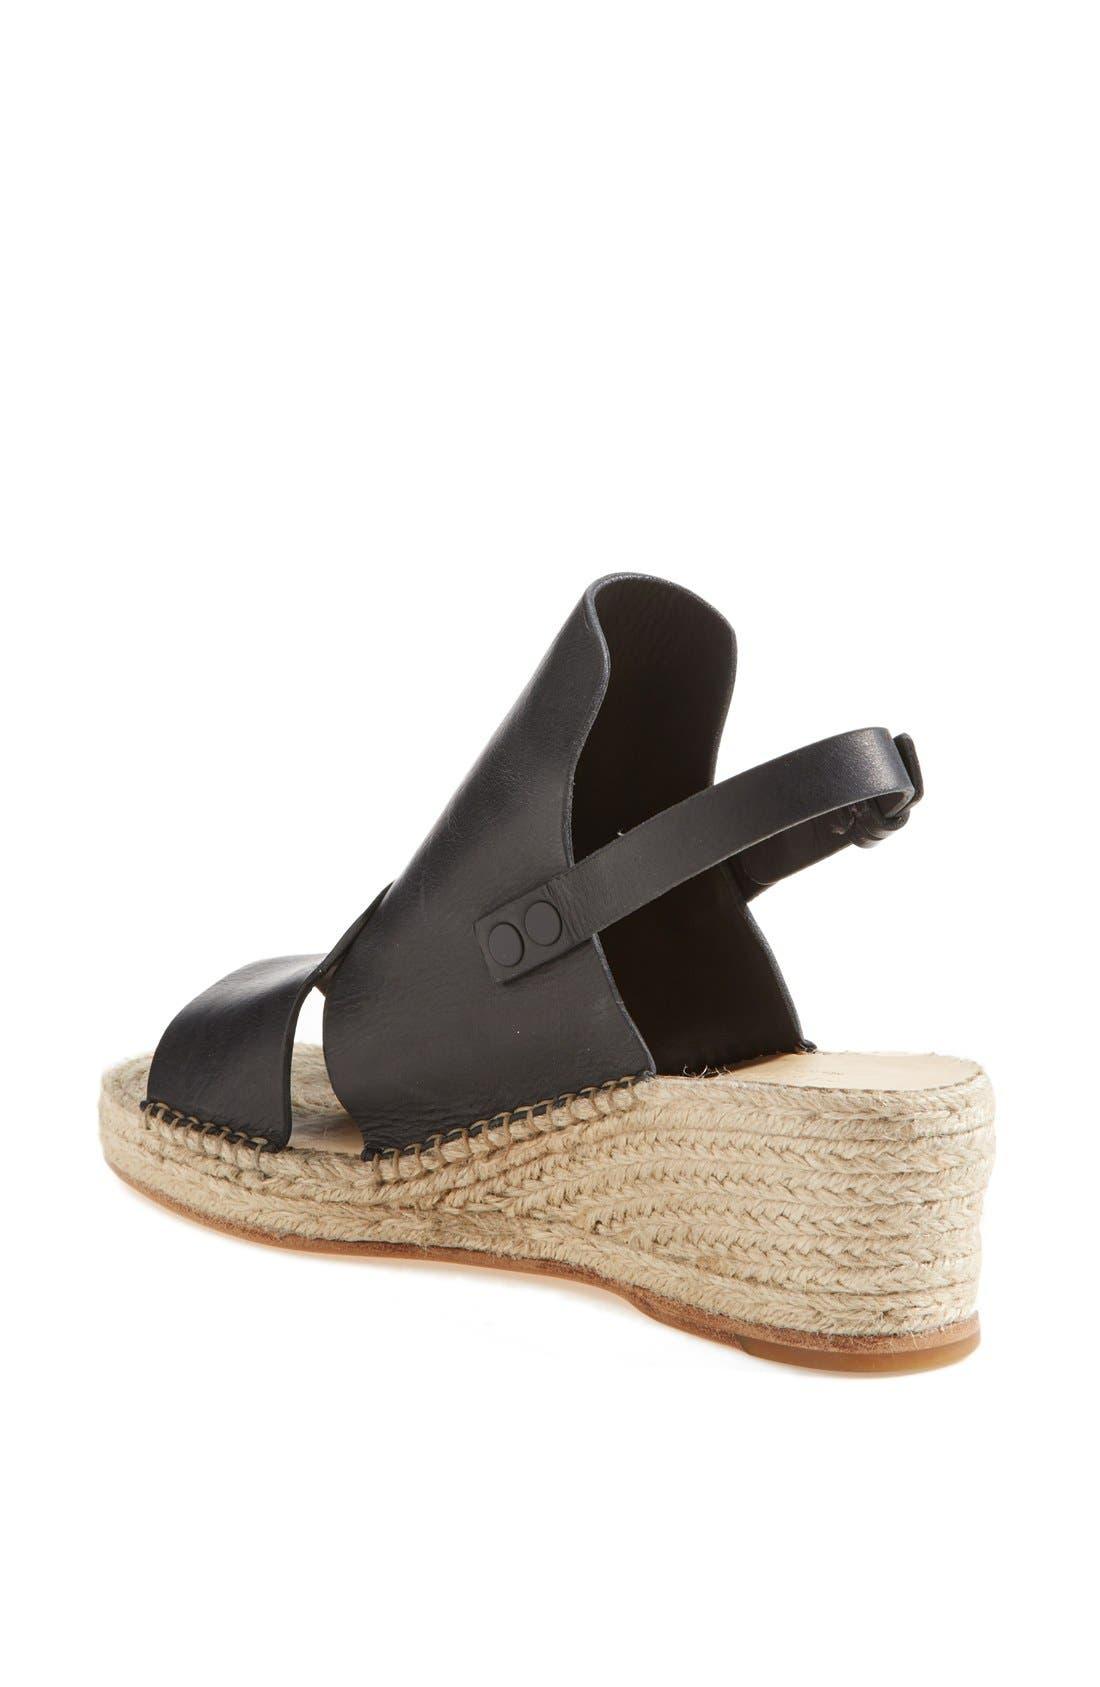 Alternate Image 2  - rag & bone 'Sayre II' Espadrille Wedge Sandal